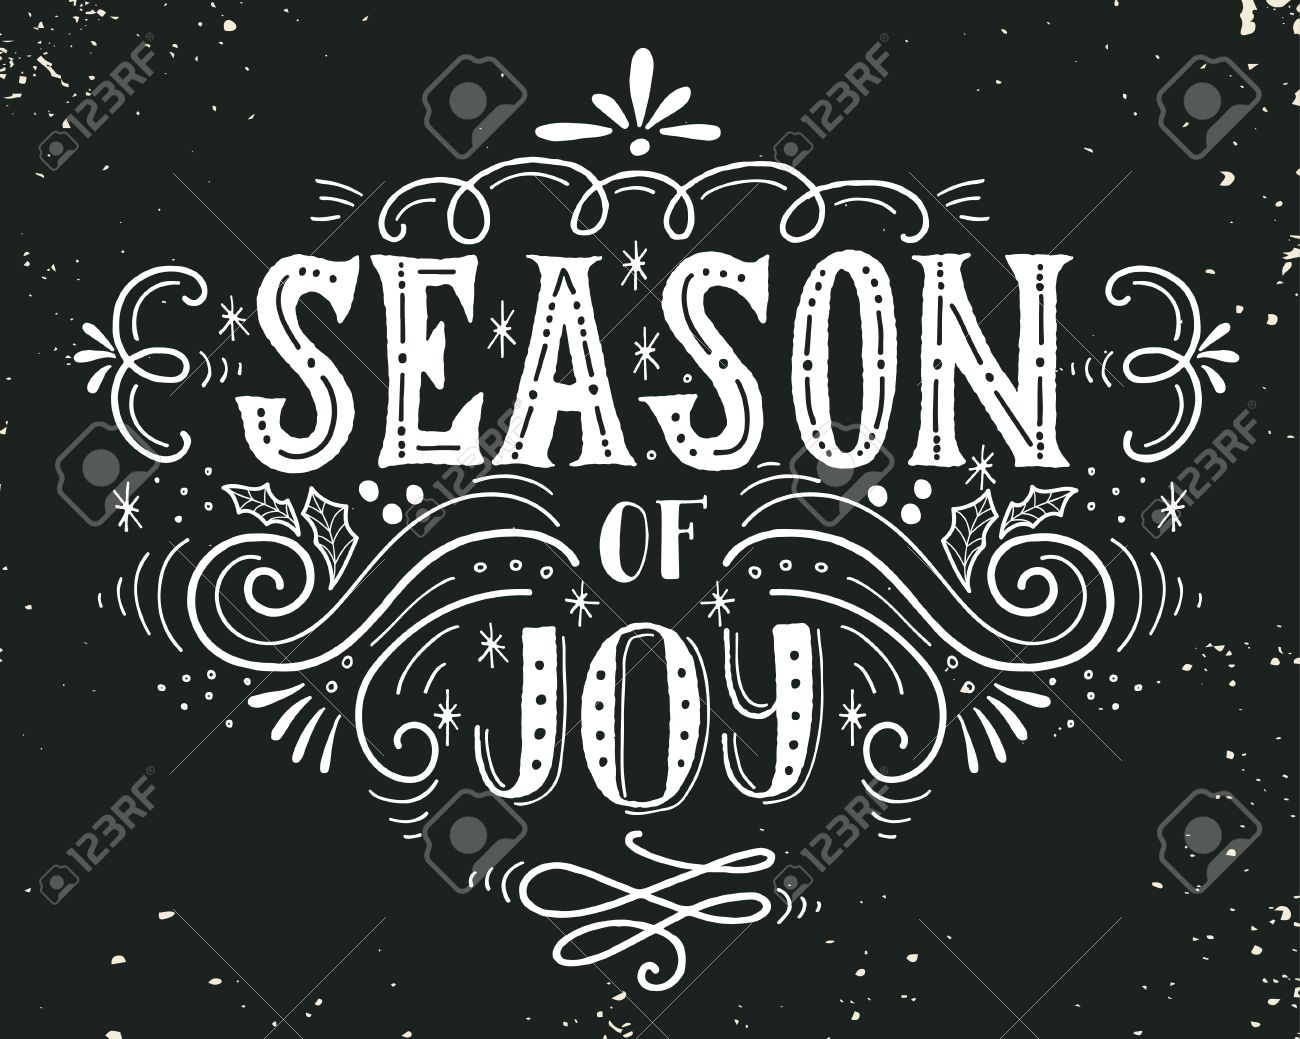 Season of joy christmas retro poster with hand lettering and season of joy christmas retro poster with hand lettering and decoration elements this illustration kristyandbryce Image collections